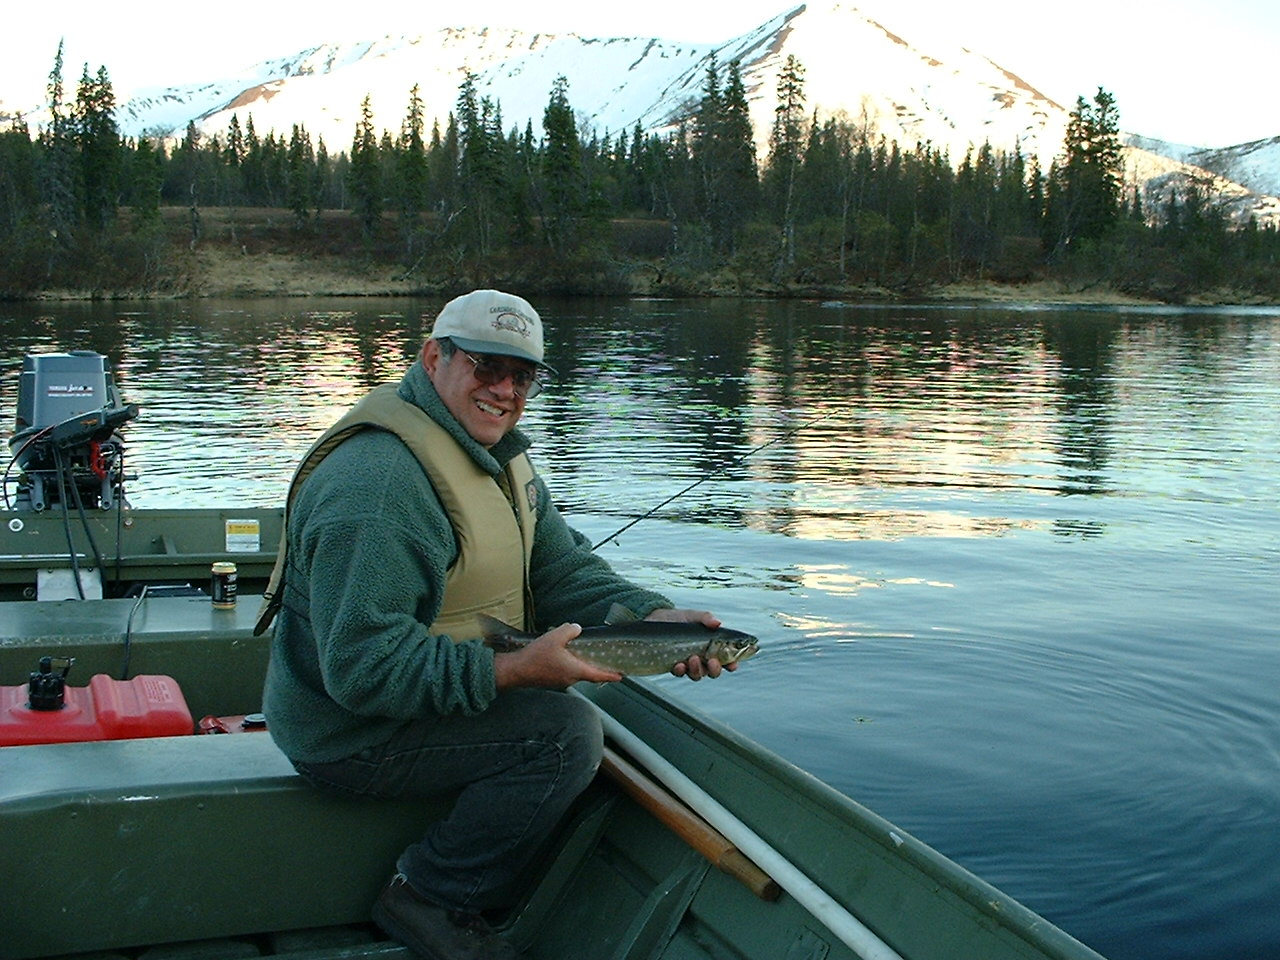 VEI Consultants - Alaska Civil and Environmental Engineering, Transportation, Water, Wastewater, Surveying Services